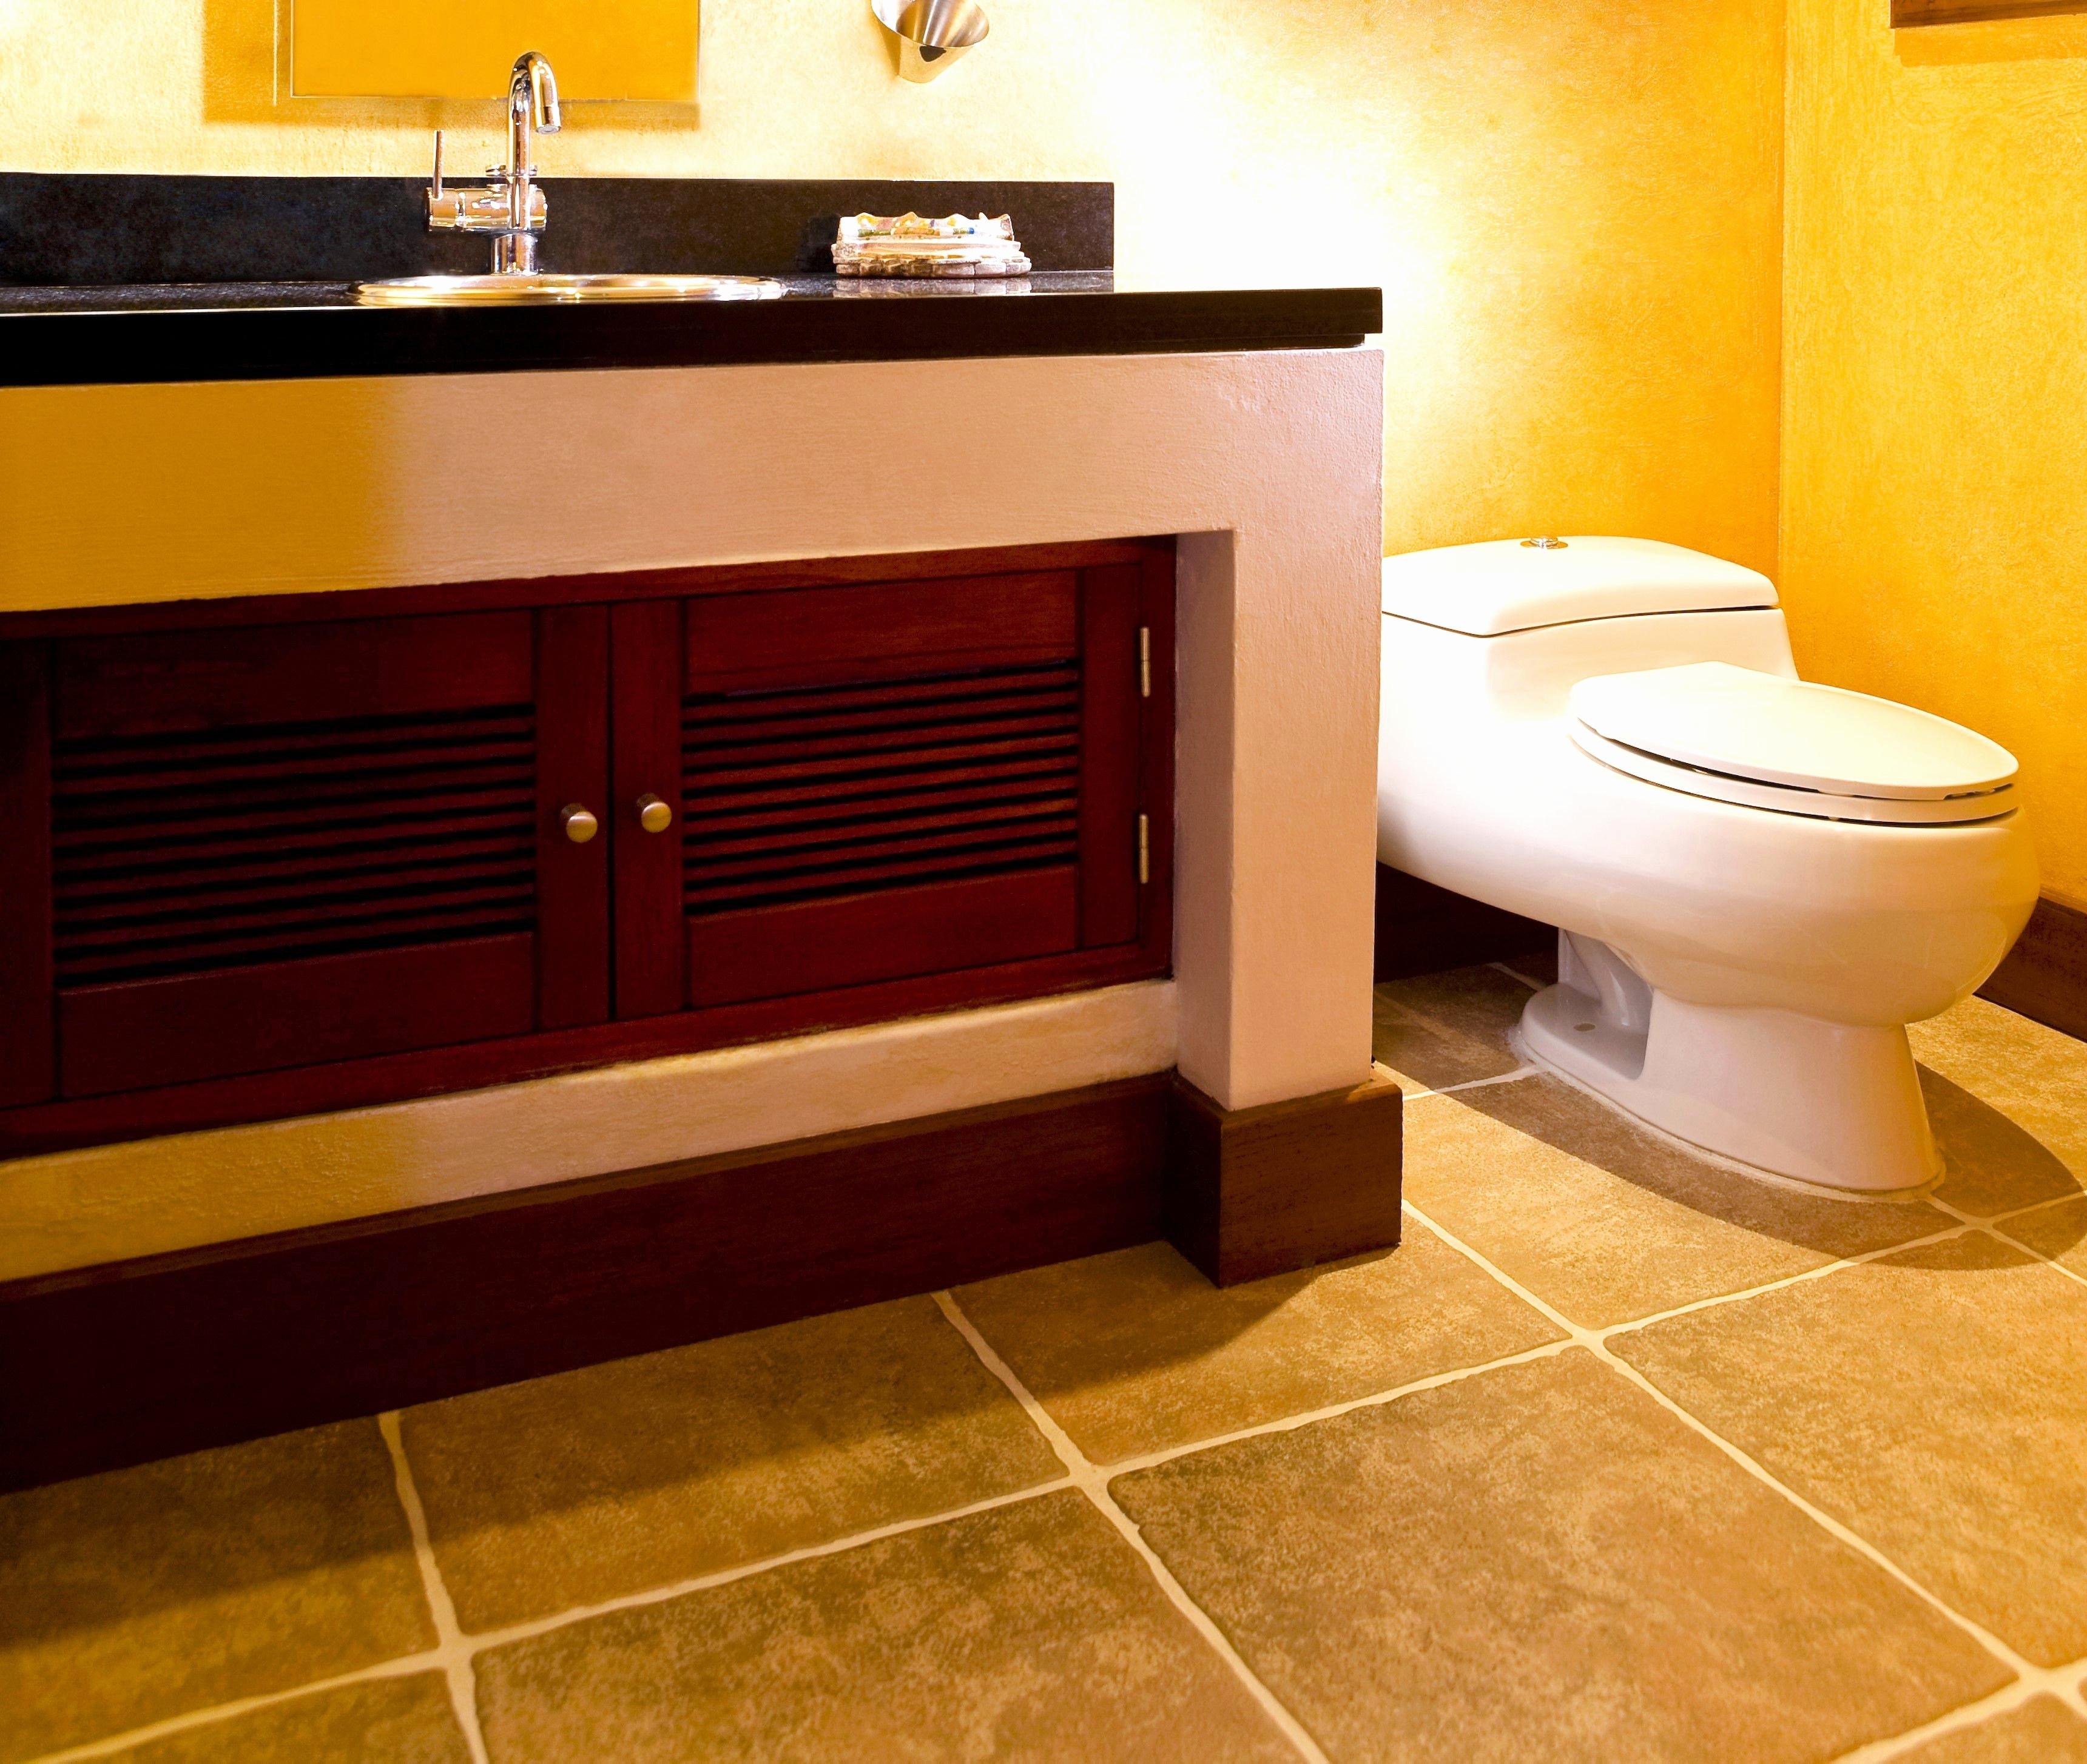 bona x hardwood floor cleaner concentrate of bona tile cleaner inspirational bona hardwood floor cleaner refill regarding bona tile cleaner new diy tile floor cleaner best homemade solution for cleaning tile